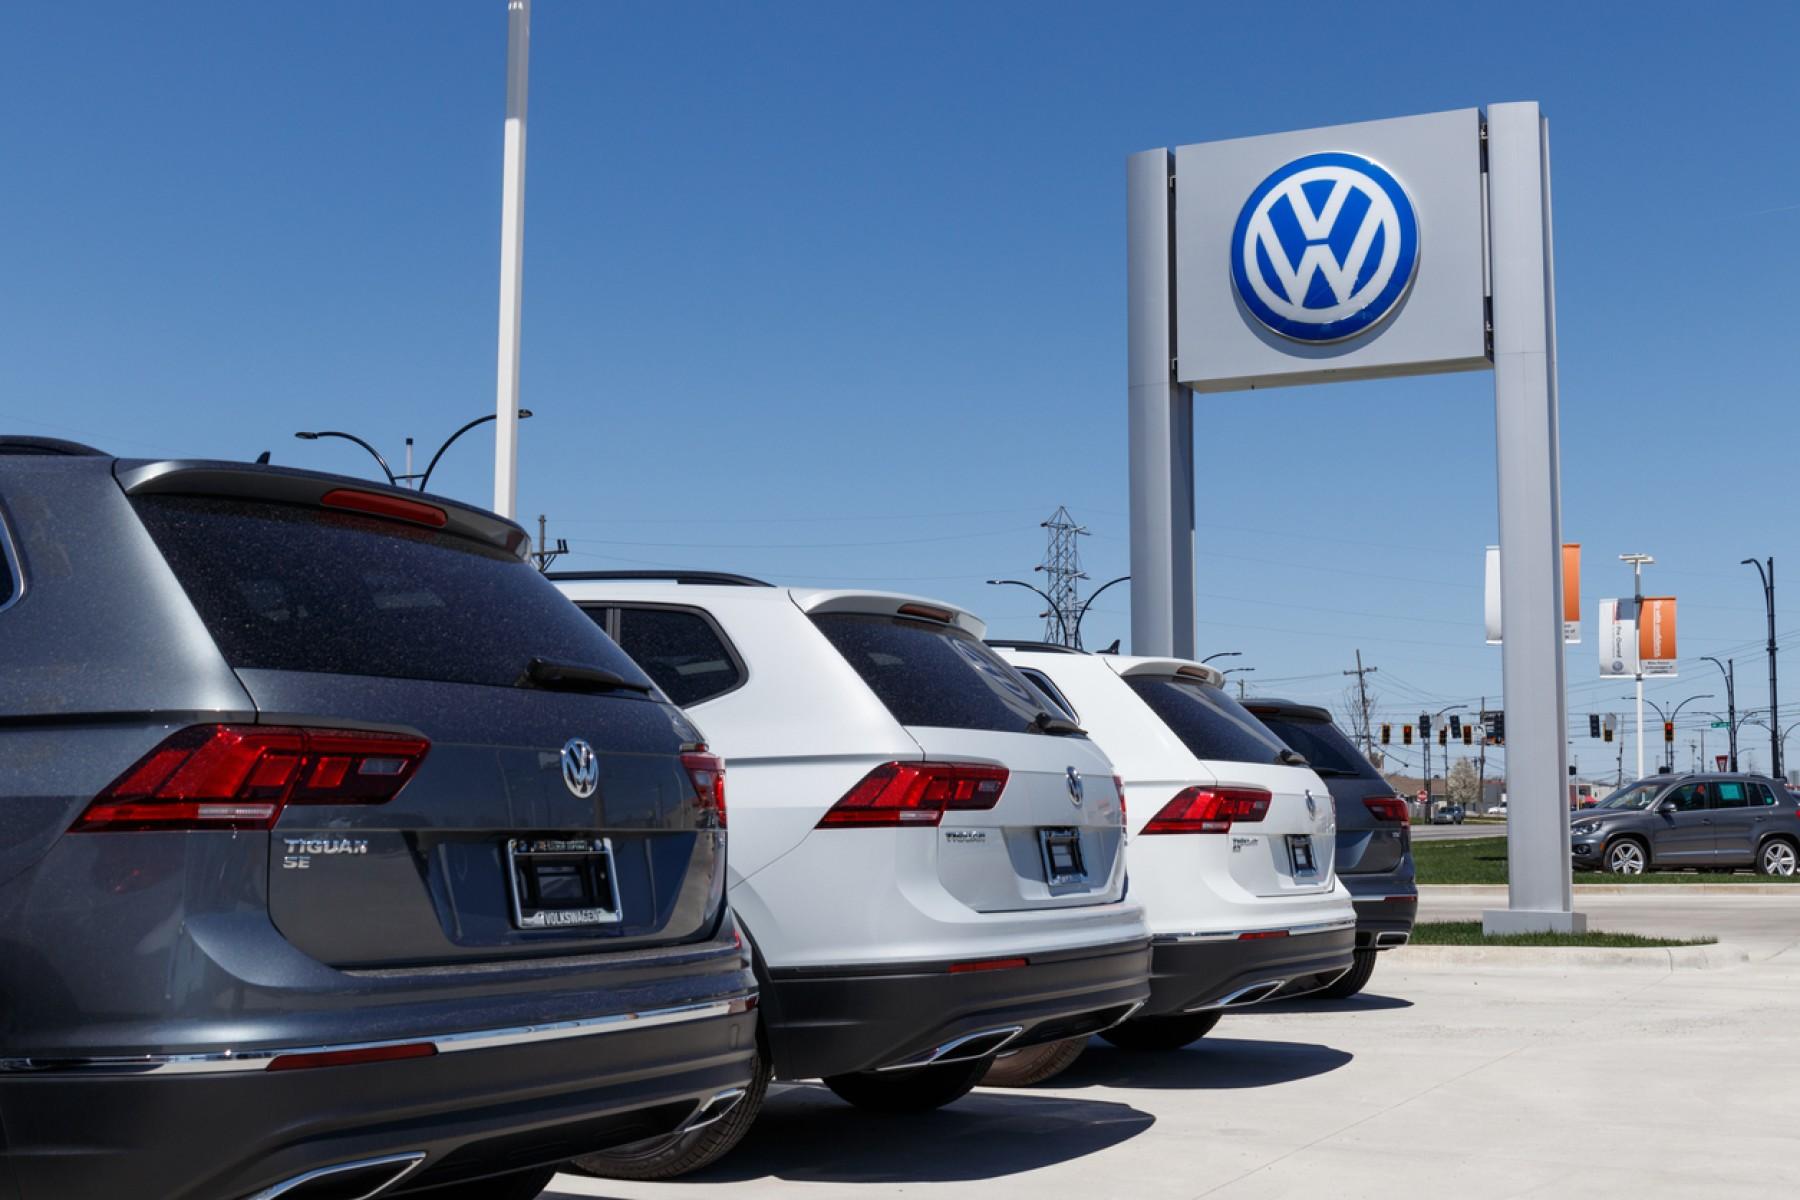 Venta de autos en México cae 28% en 2020, a menos de 950 mil unidades